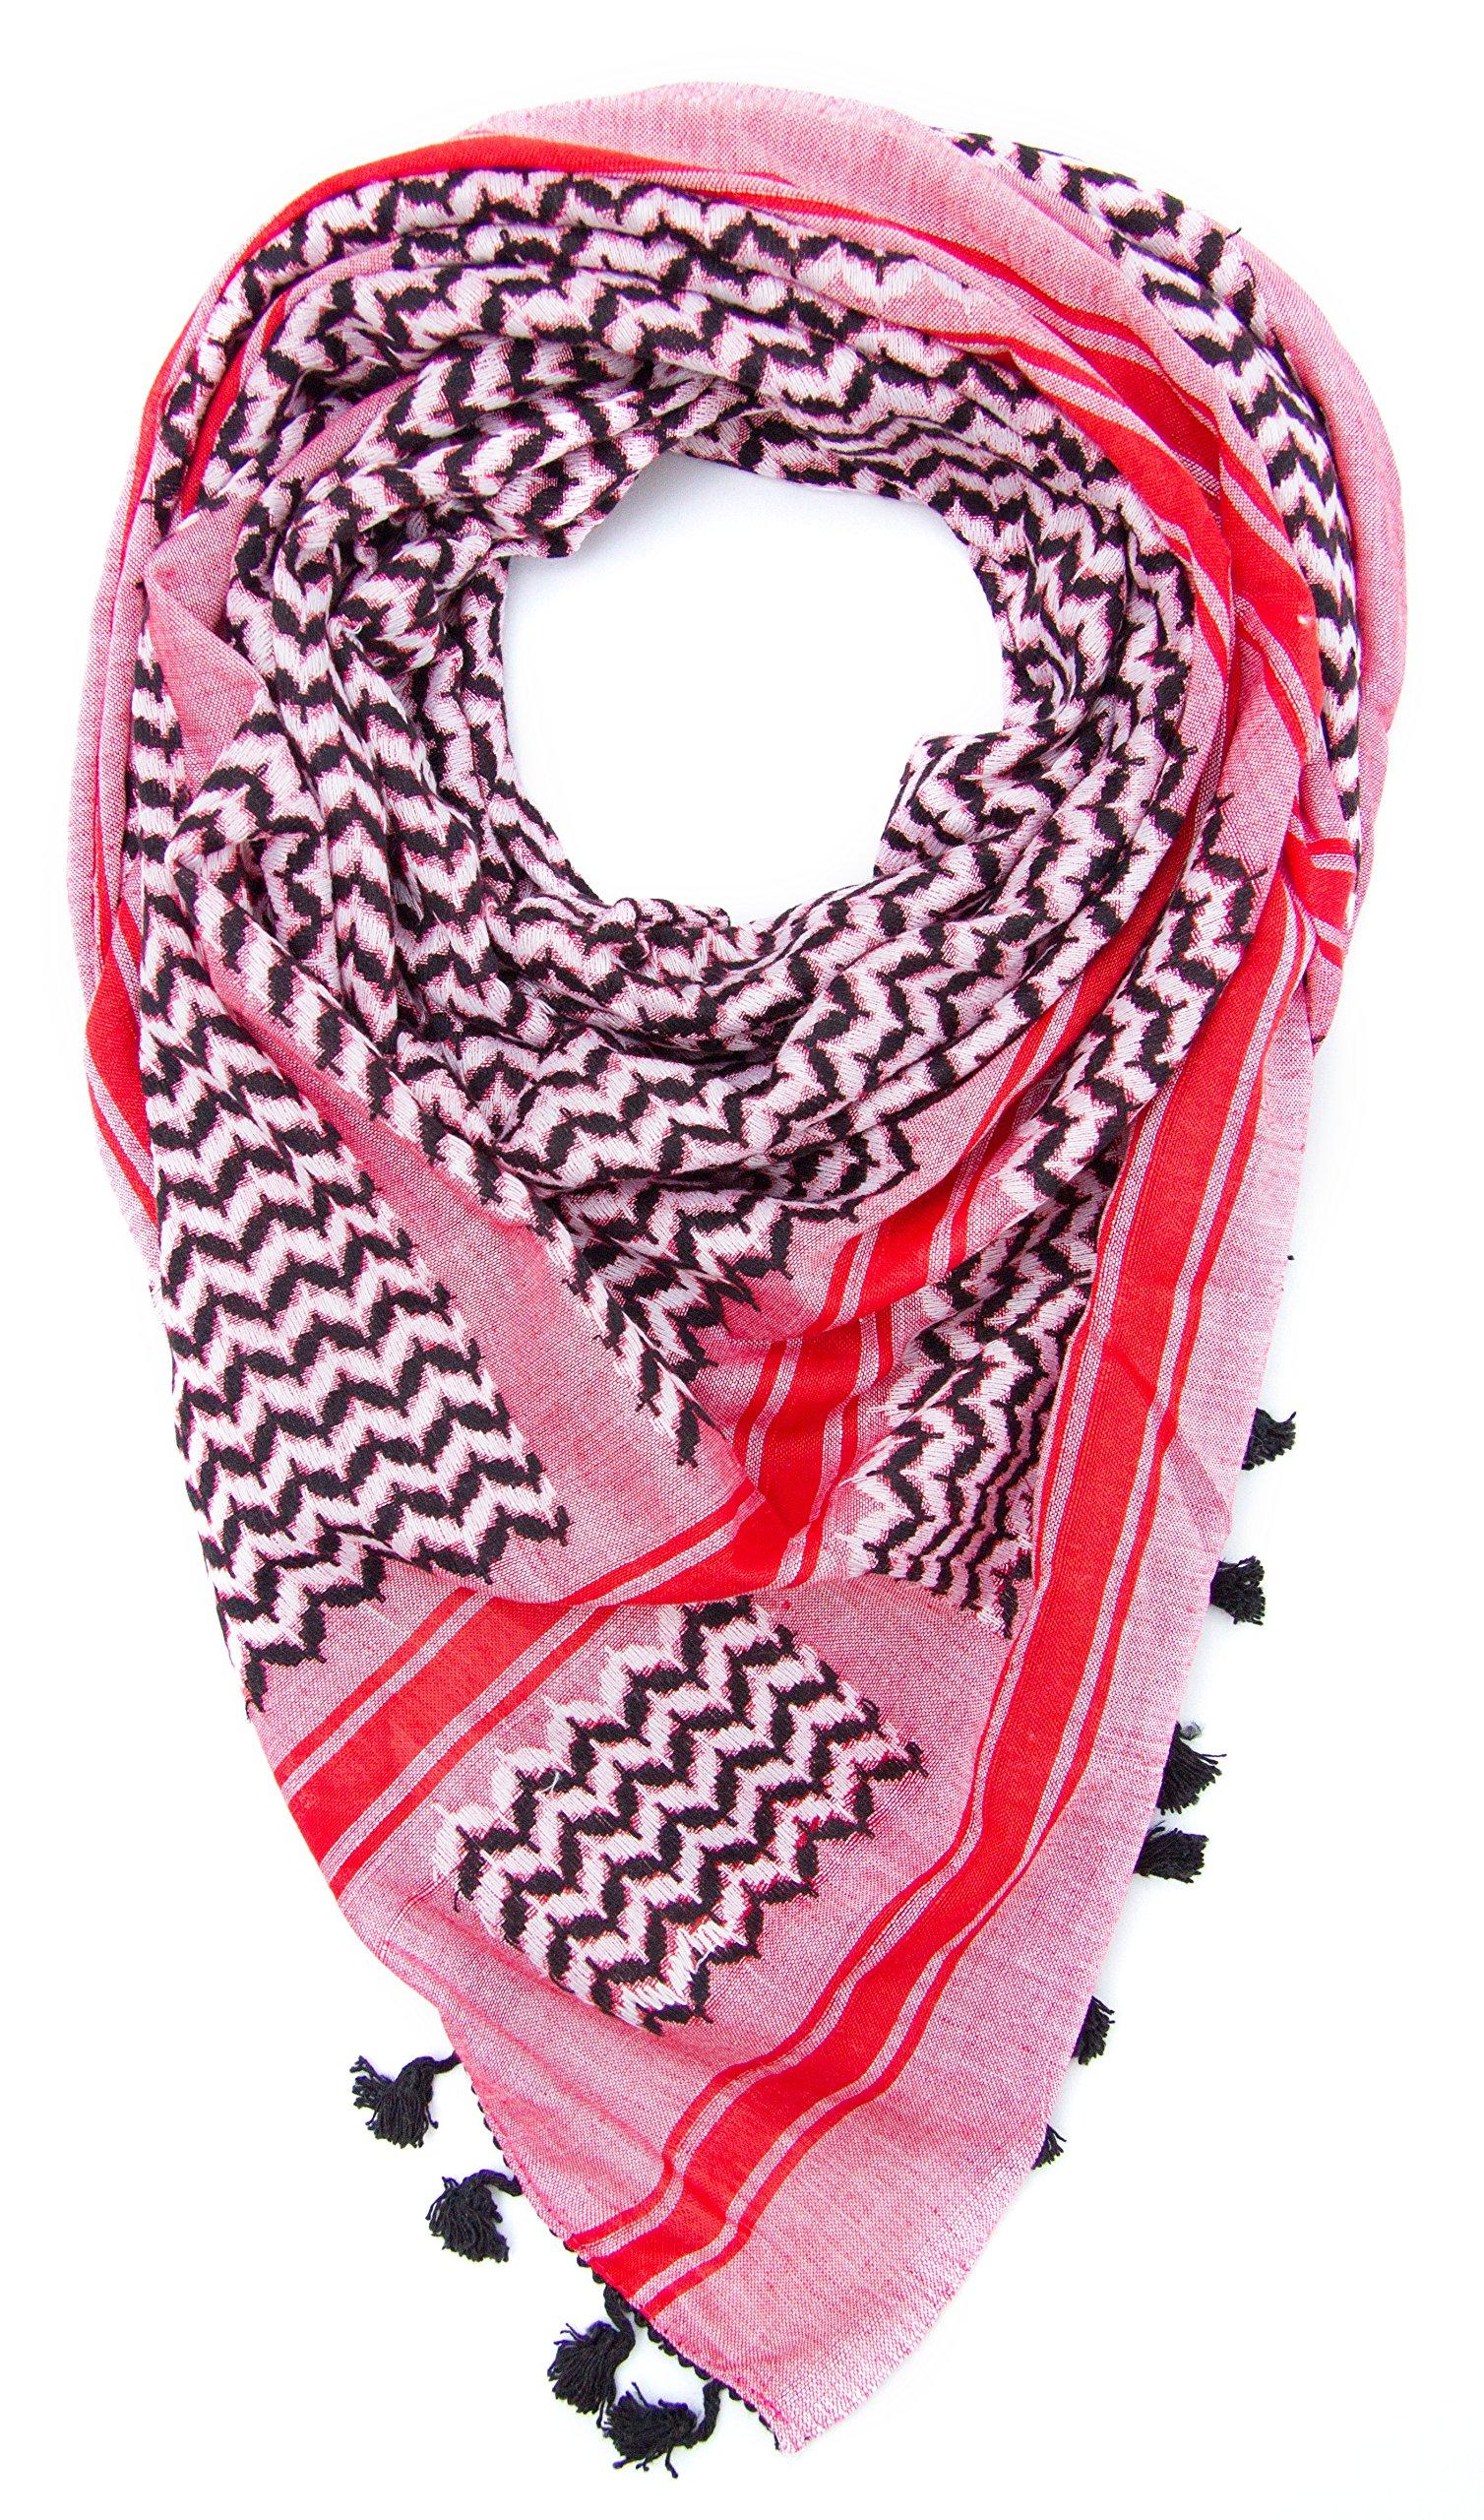 Hirbawi Premium Arabic Scarf 100% Cotton Shemagh Keffiyeh 47''x47'' Arab Scarf (Pink Zahra) Made in Palestine by Hirbawi (Image #9)